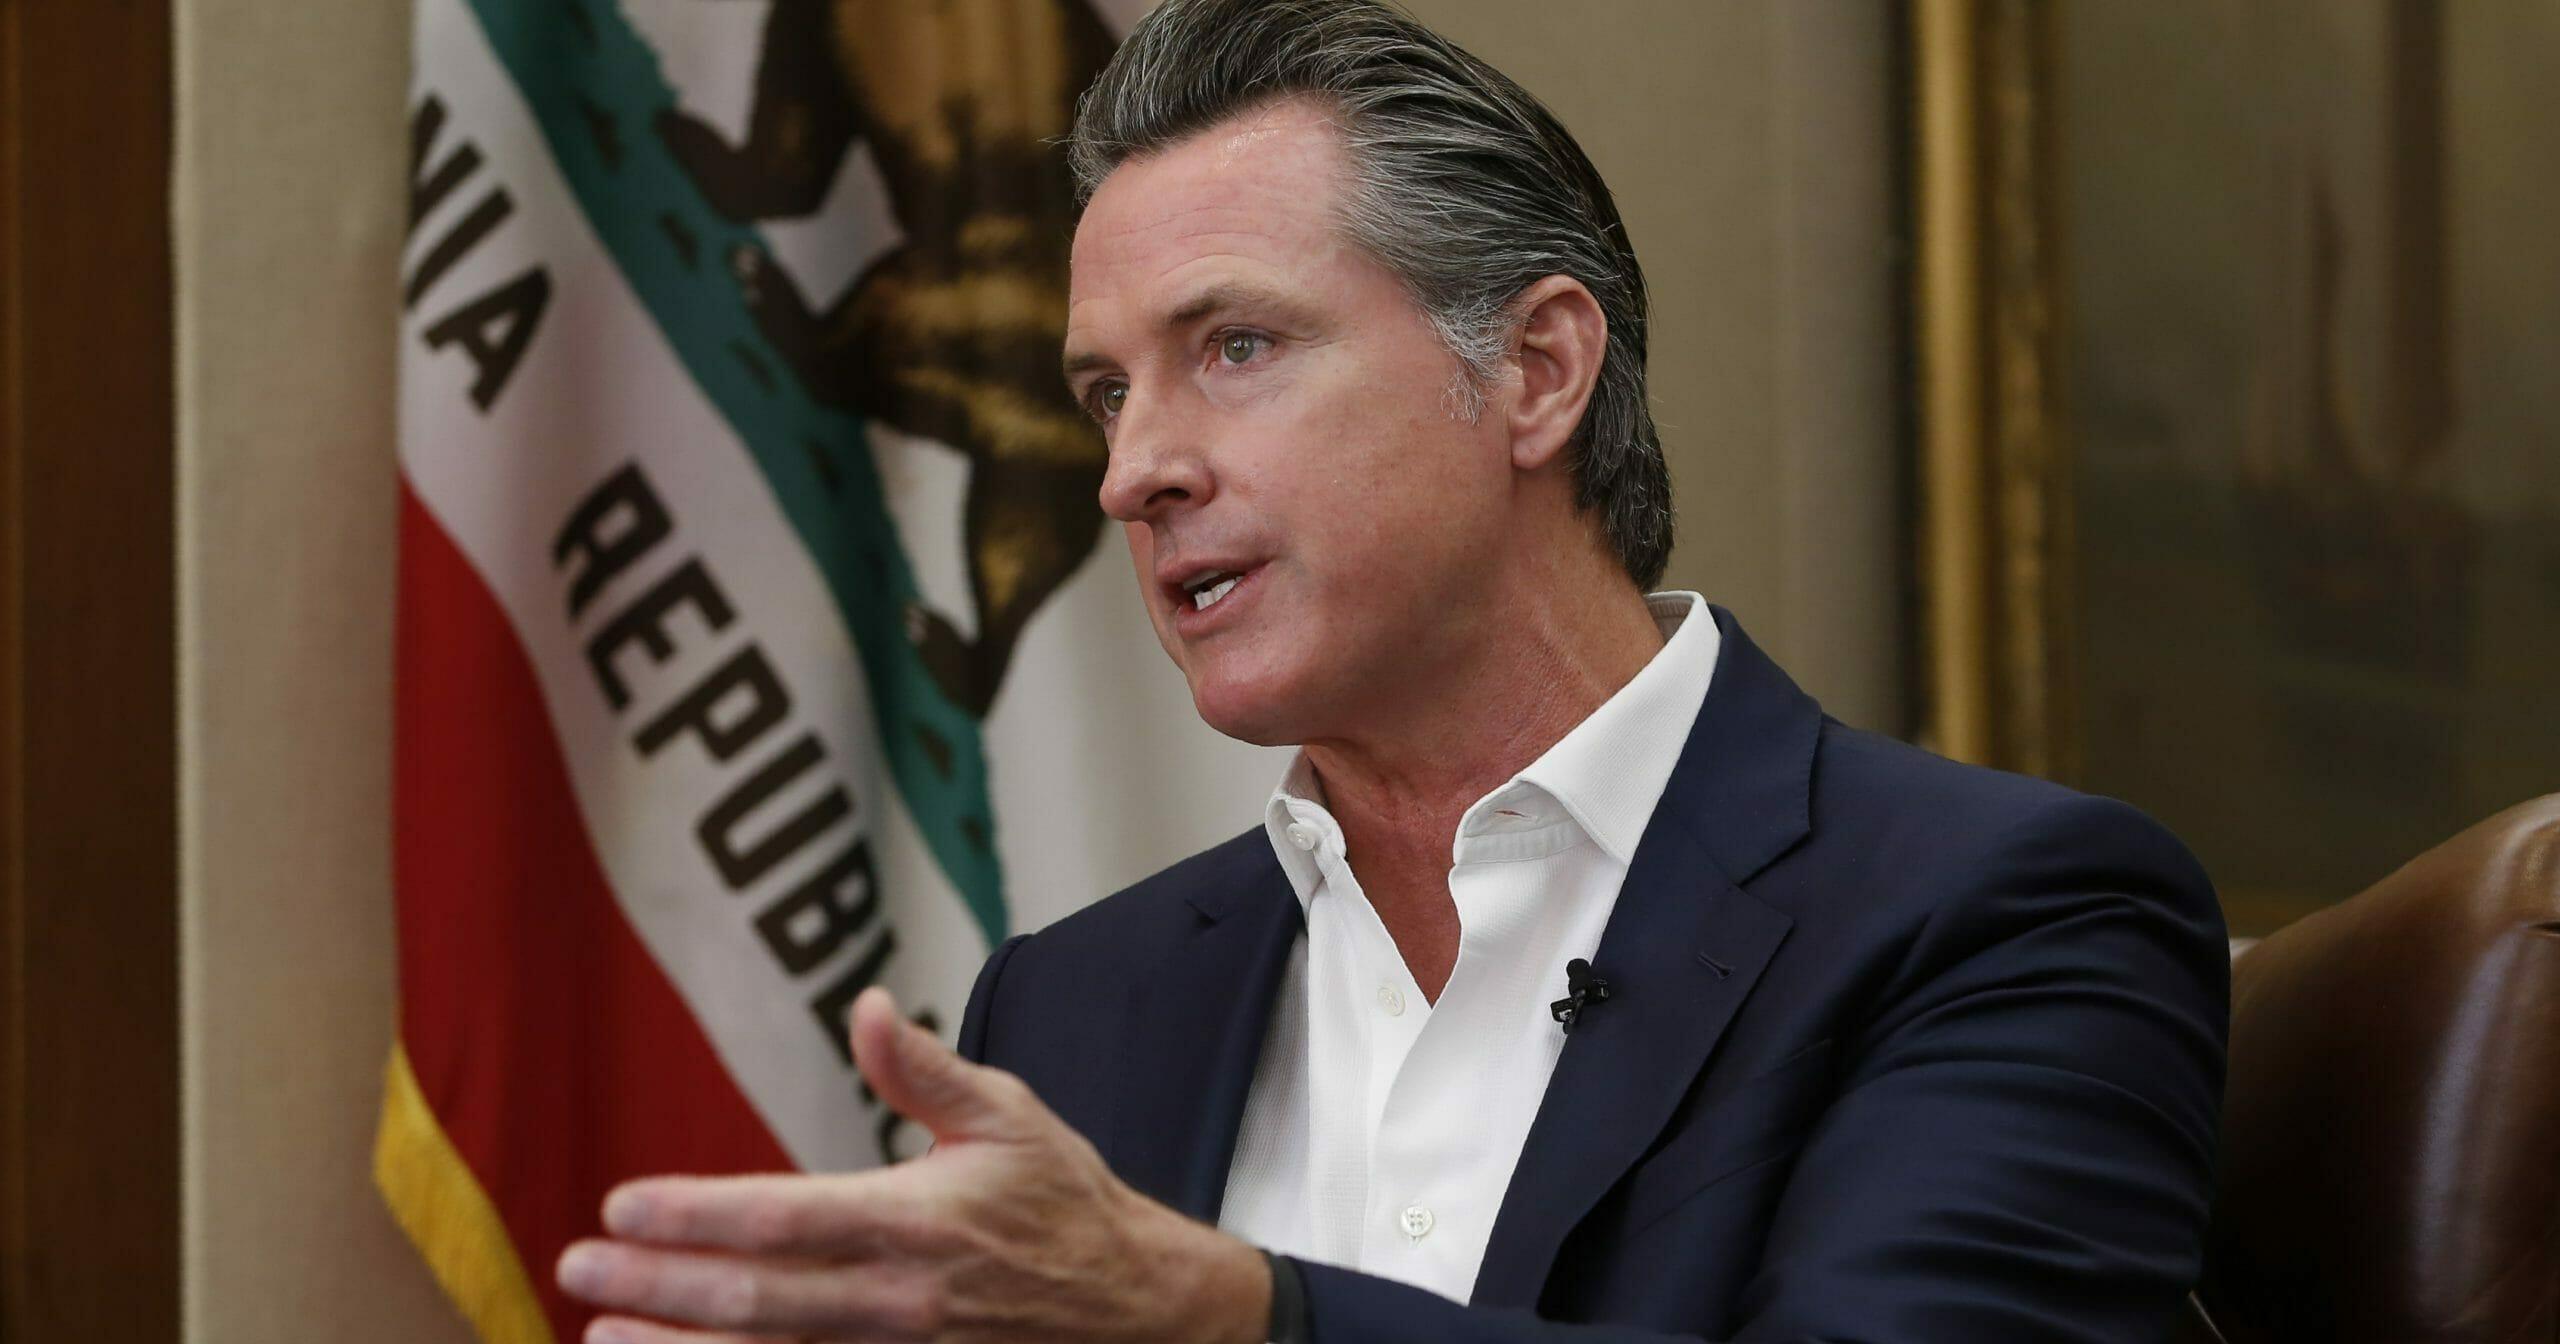 California Gov. Gavin Newsom speaks during an interview Oct. 8, 2019, in Sacramento.